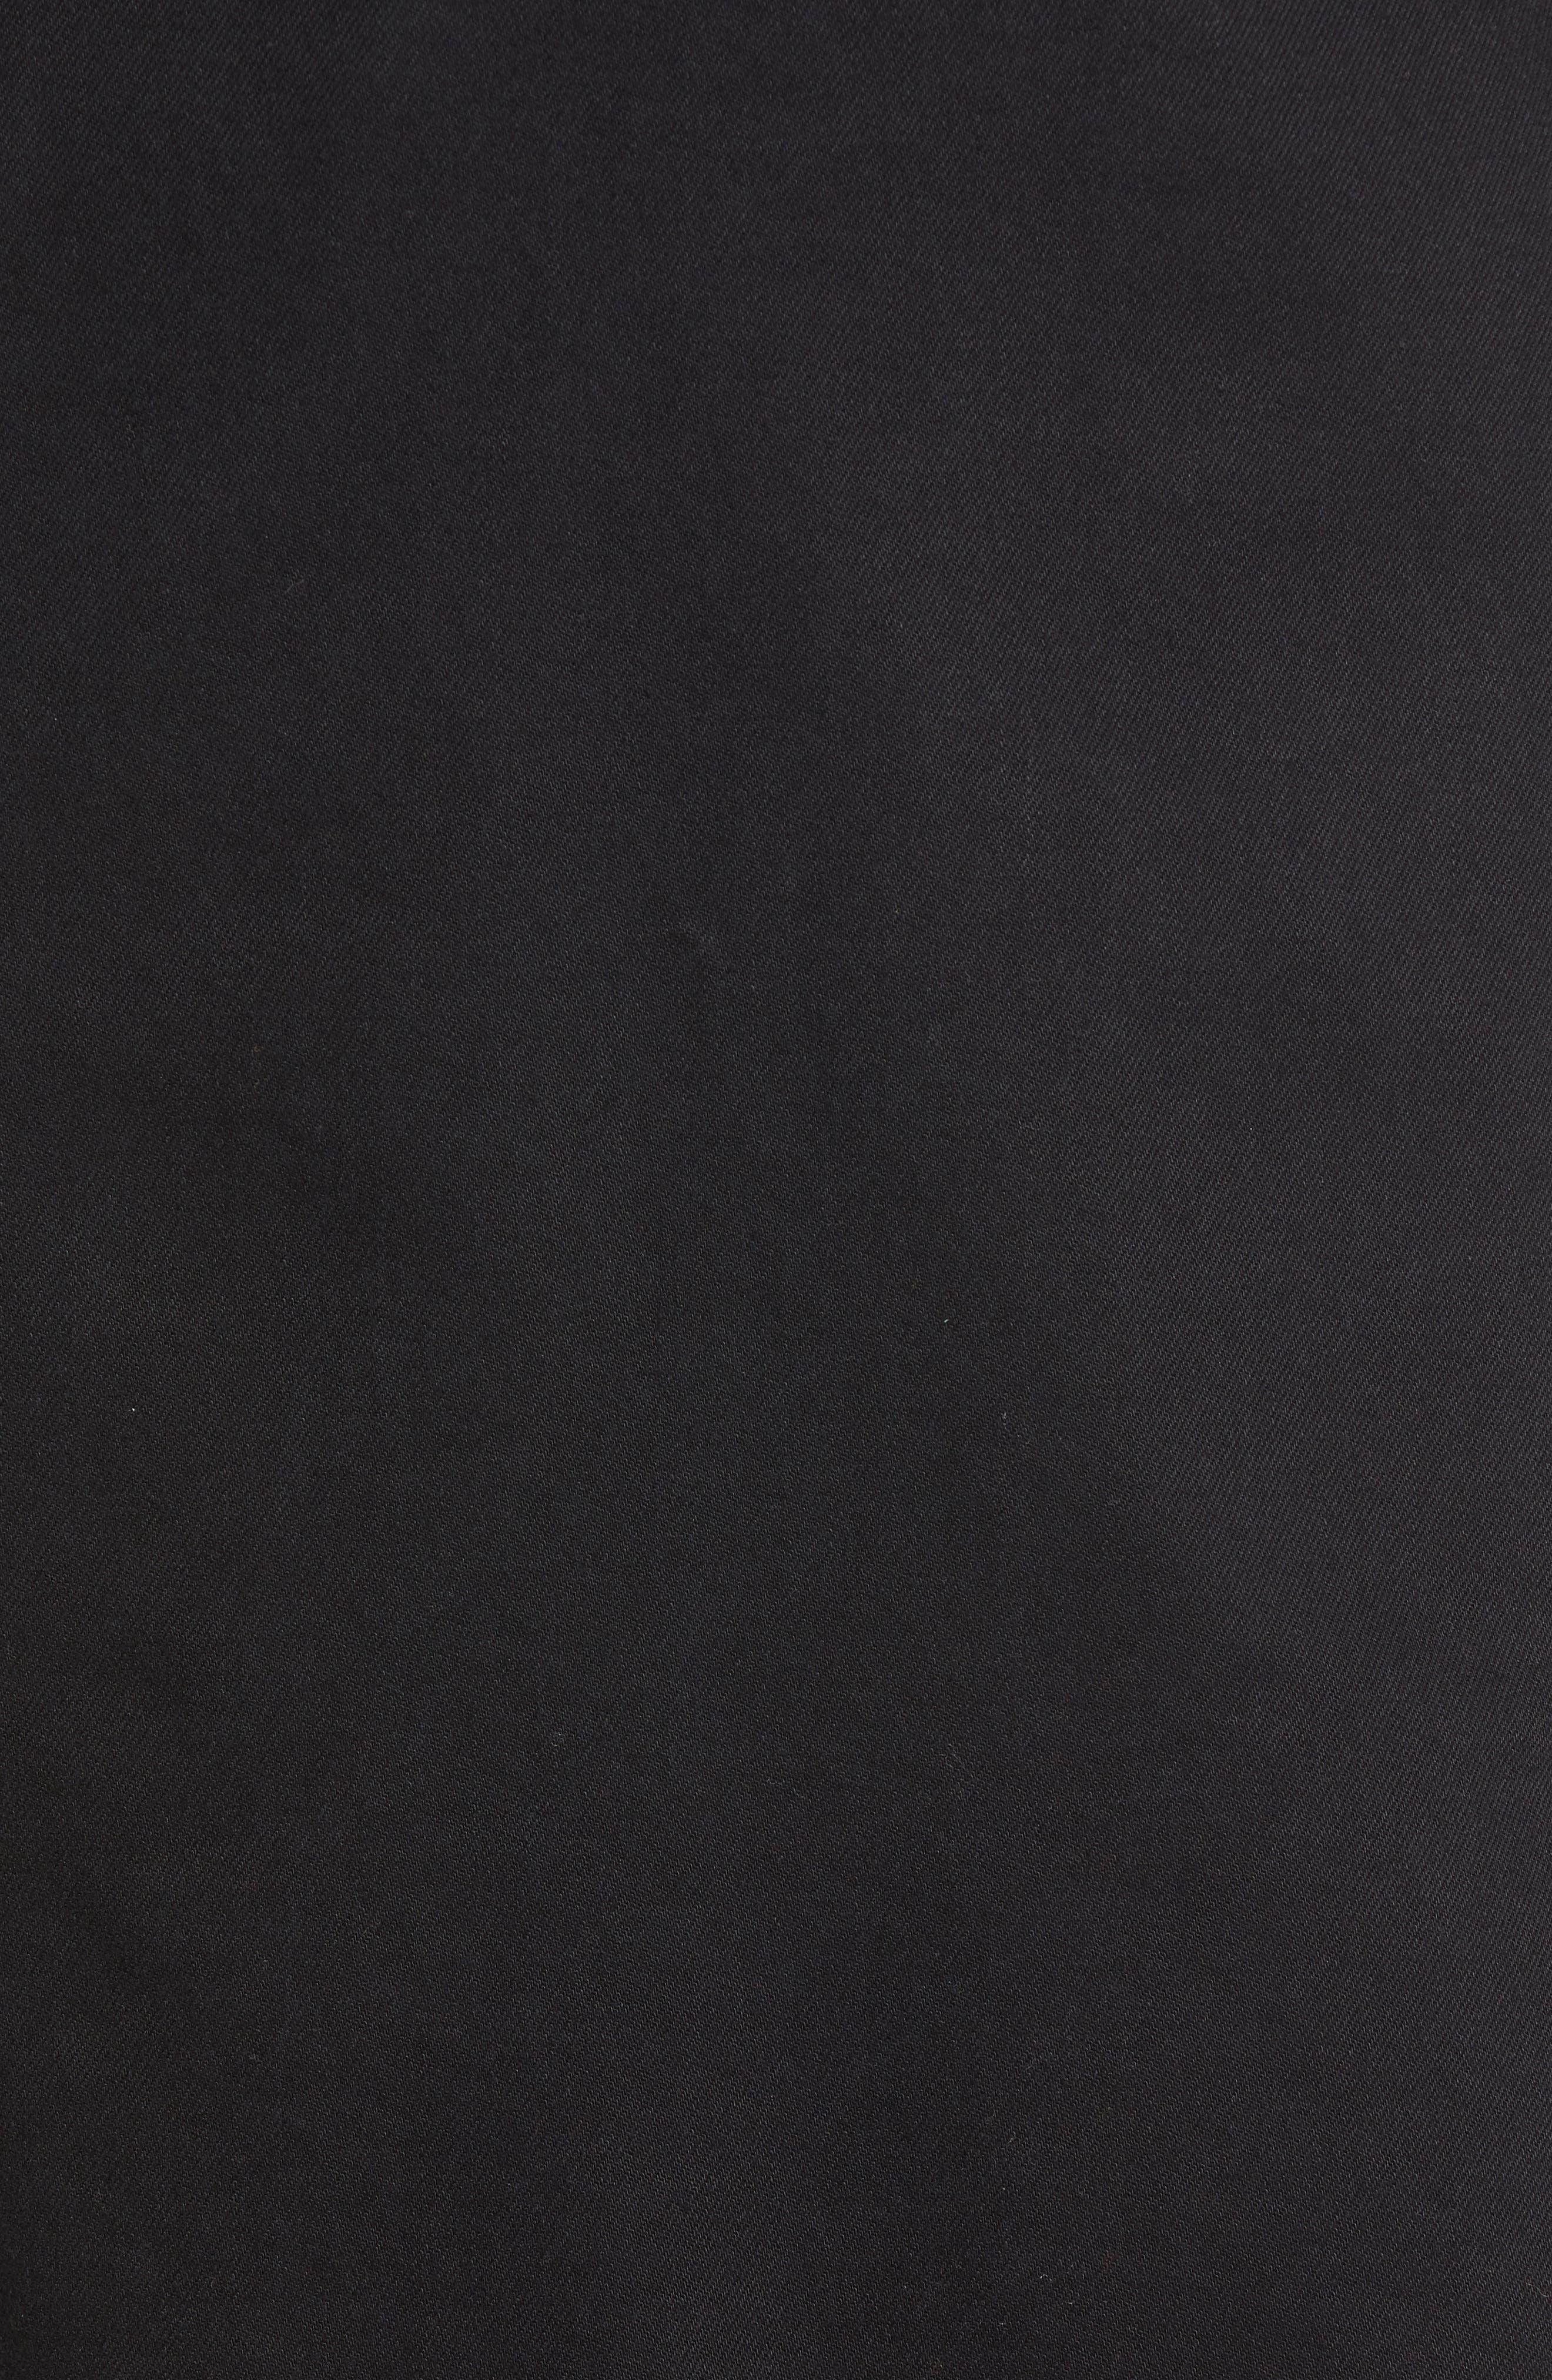 Zip Front Dress,                             Alternate thumbnail 6, color,                             BLACK STONE